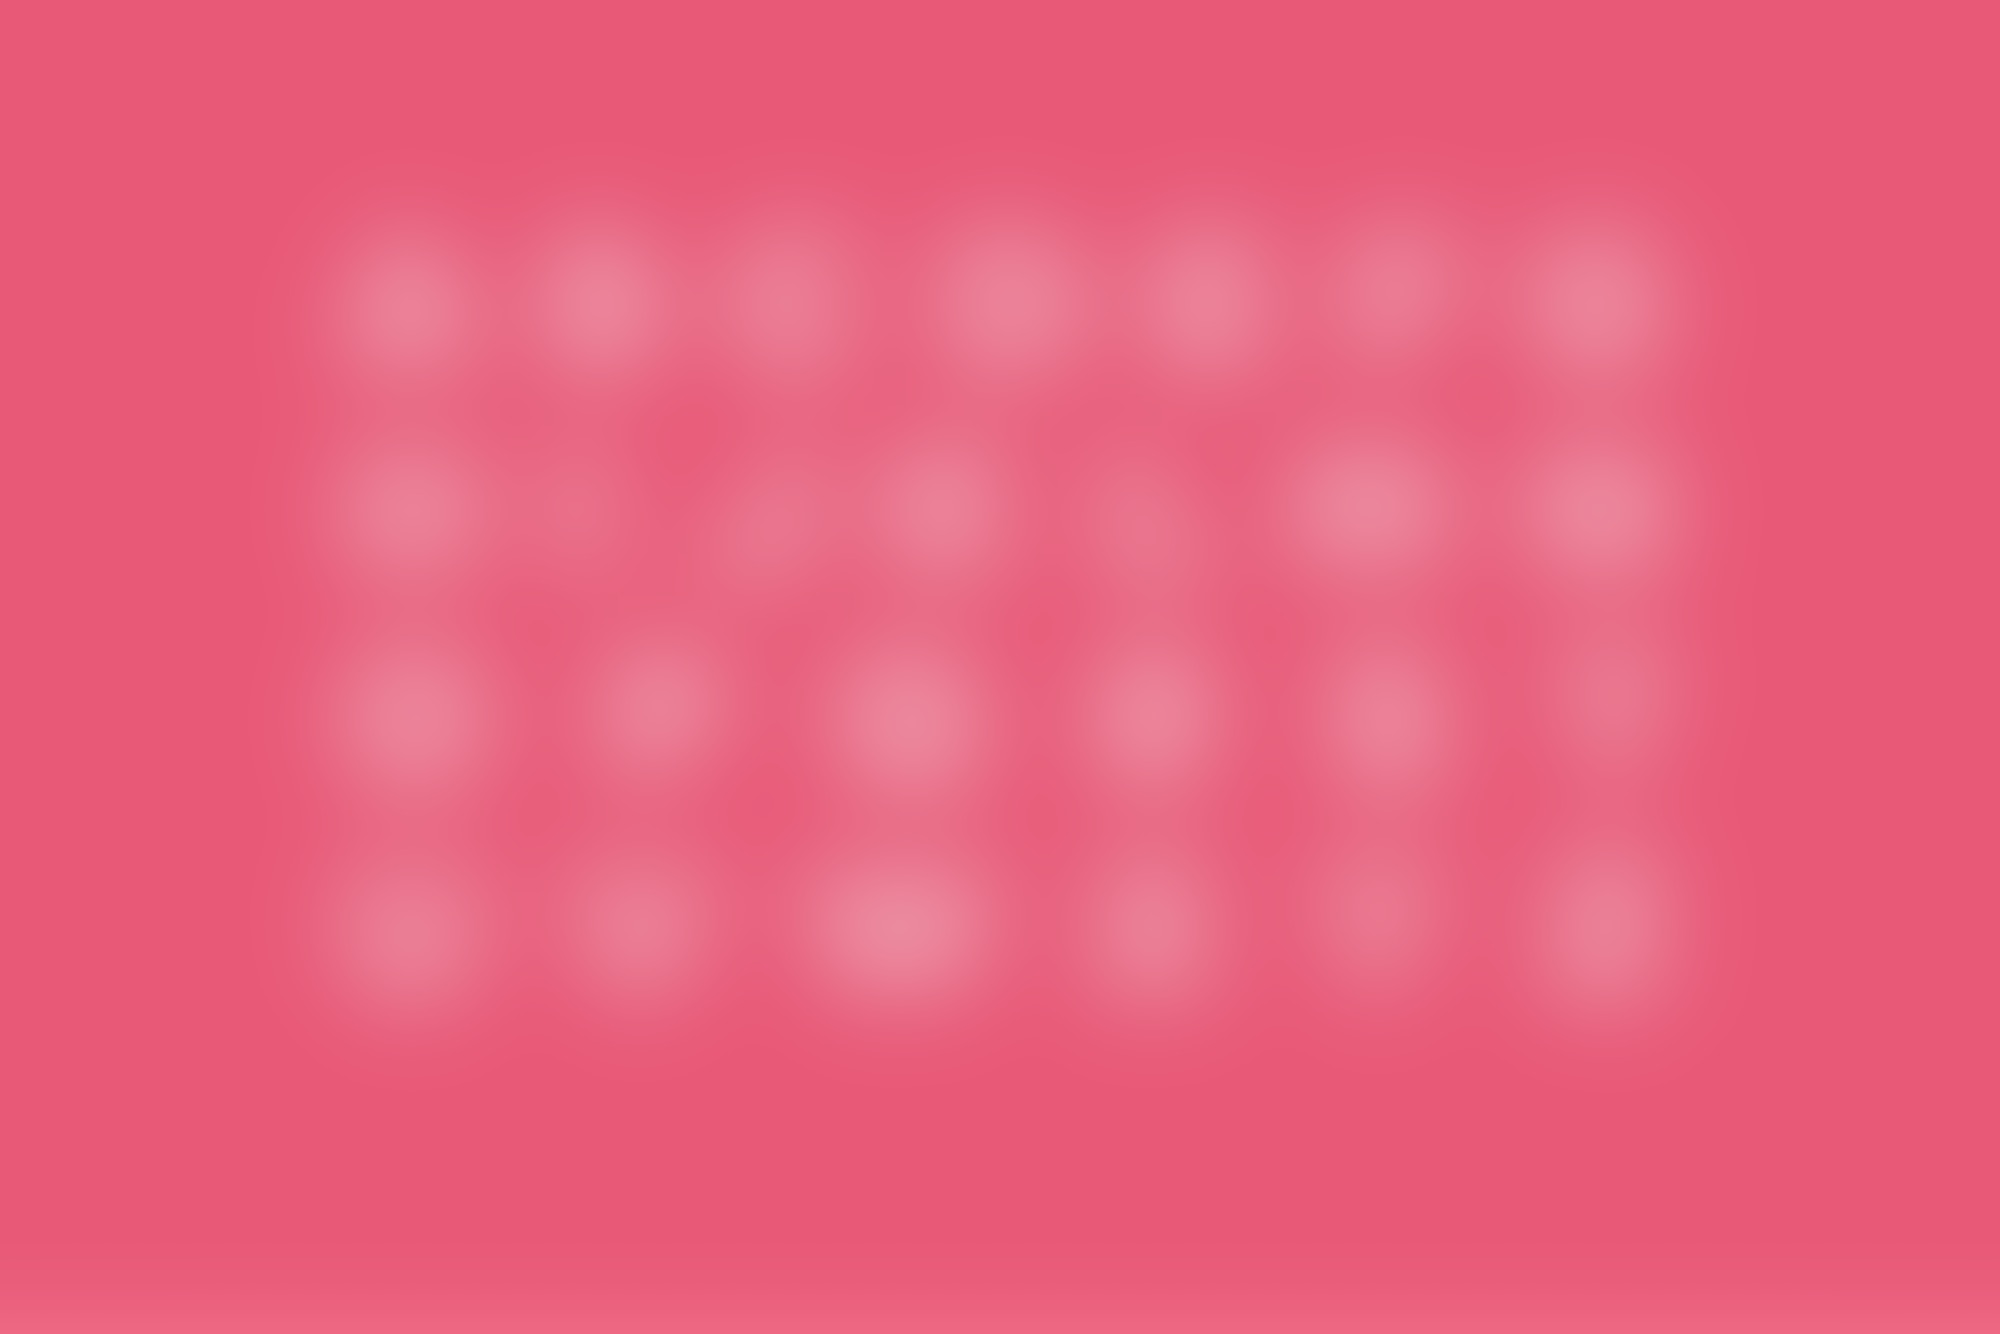 BM CL14 autocompressfitresizeixlibphp 1 1 0max h2000max w3 D2000q80s63e79b49c539c9583be9e52b0e9b83ba